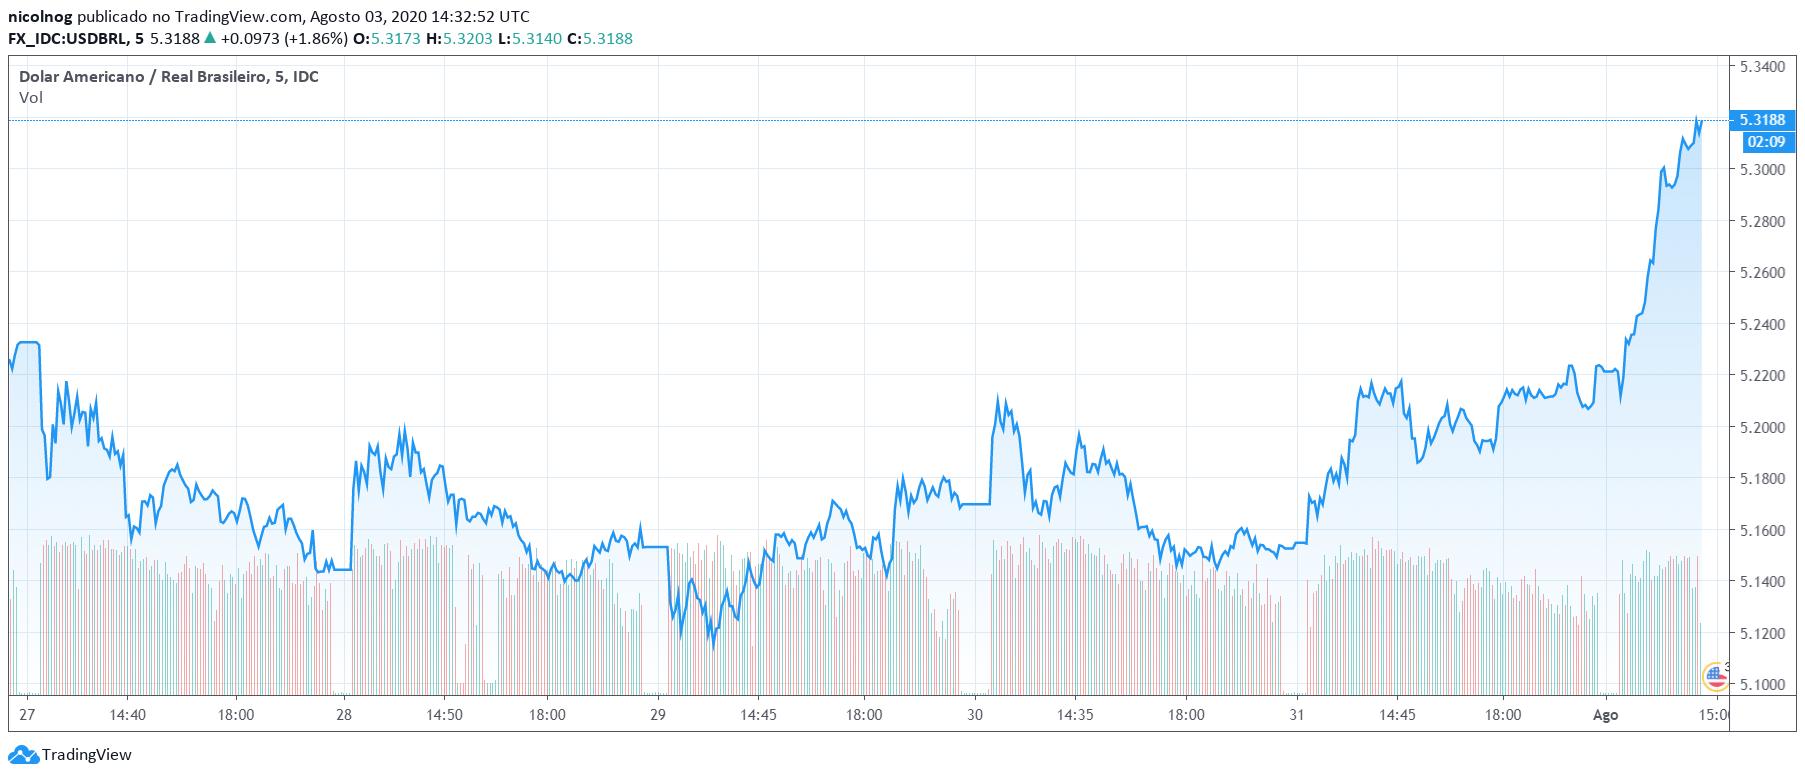 Dólar nos últimos 5 dias